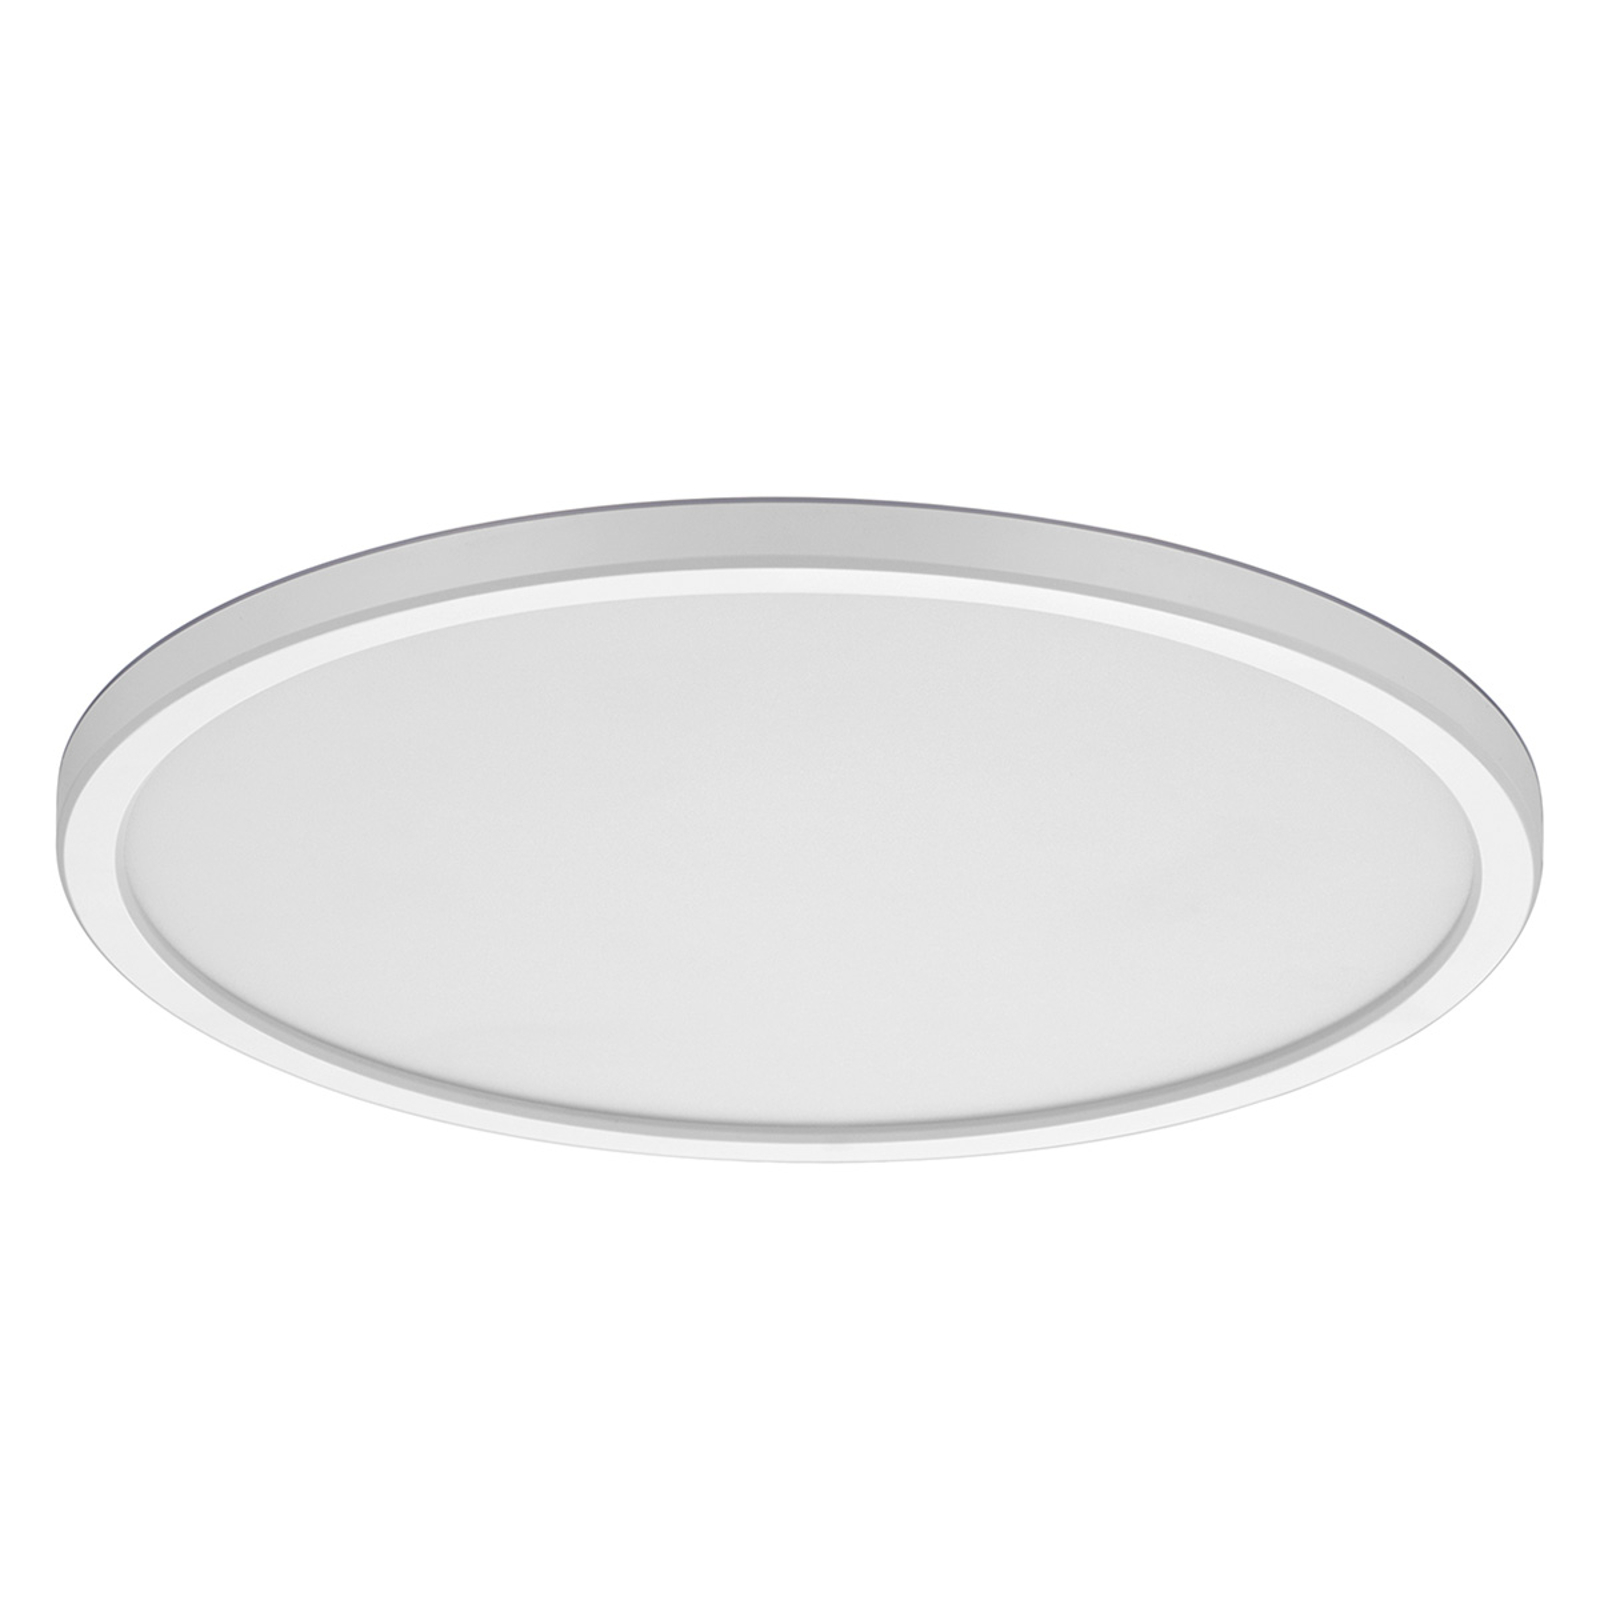 LED-Deckenleuchte Planura, dimmbar, Ø 29 cm